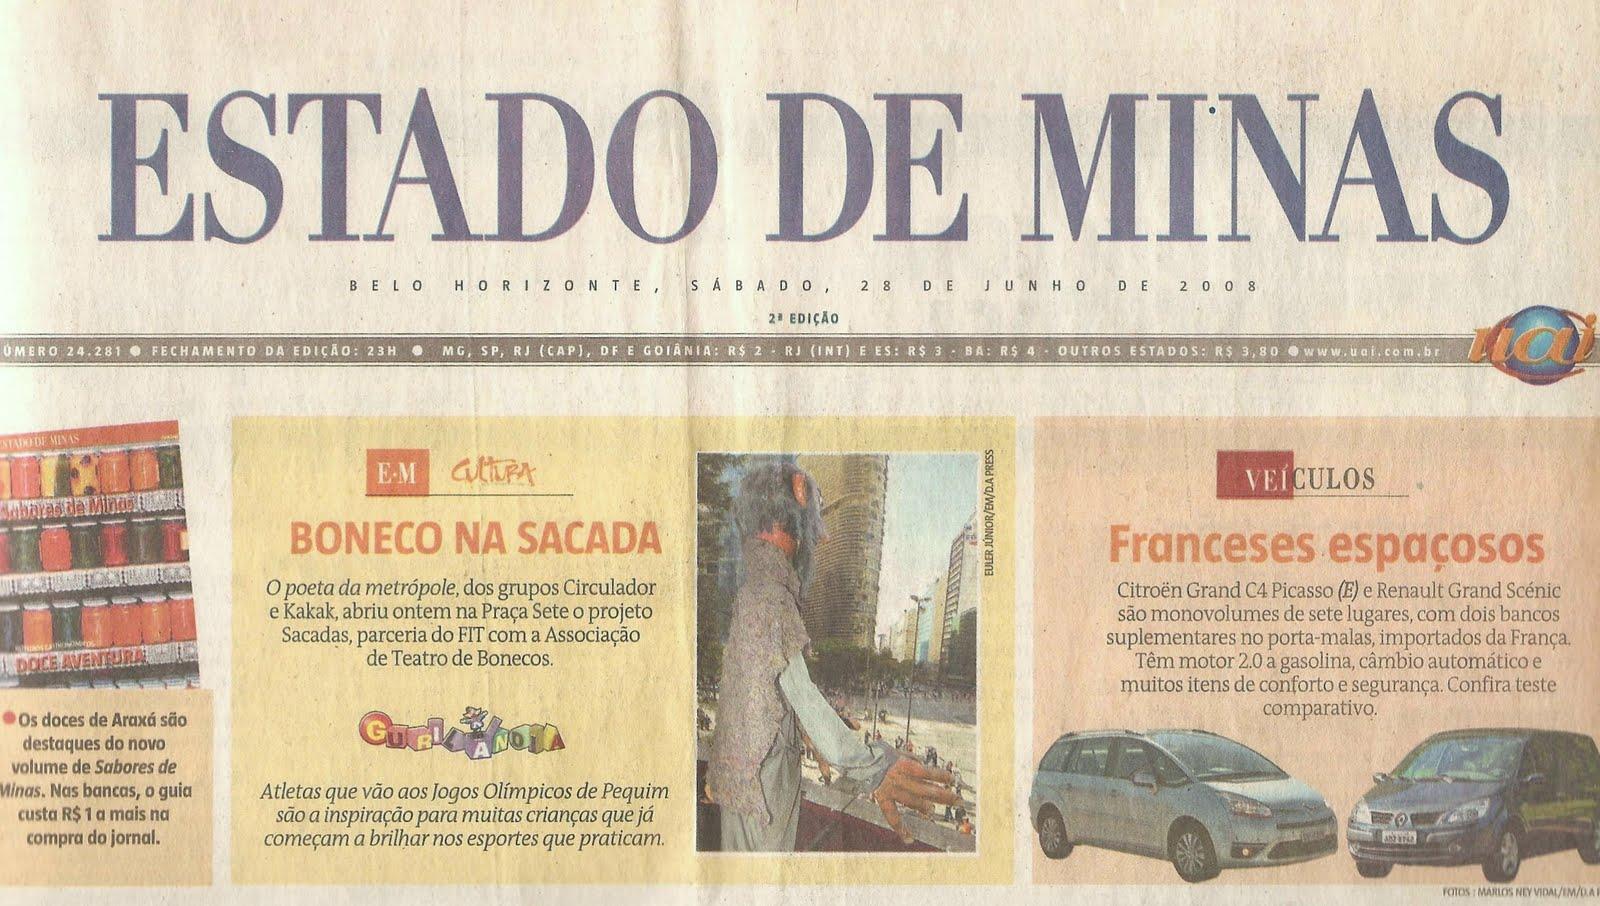 http://1.bp.blogspot.com/__tOiuCijhZ4/SxWprGzxBgI/AAAAAAAAALs/tT-li0uEUD4/s1600/rogerio+pacheco+materias.jpg